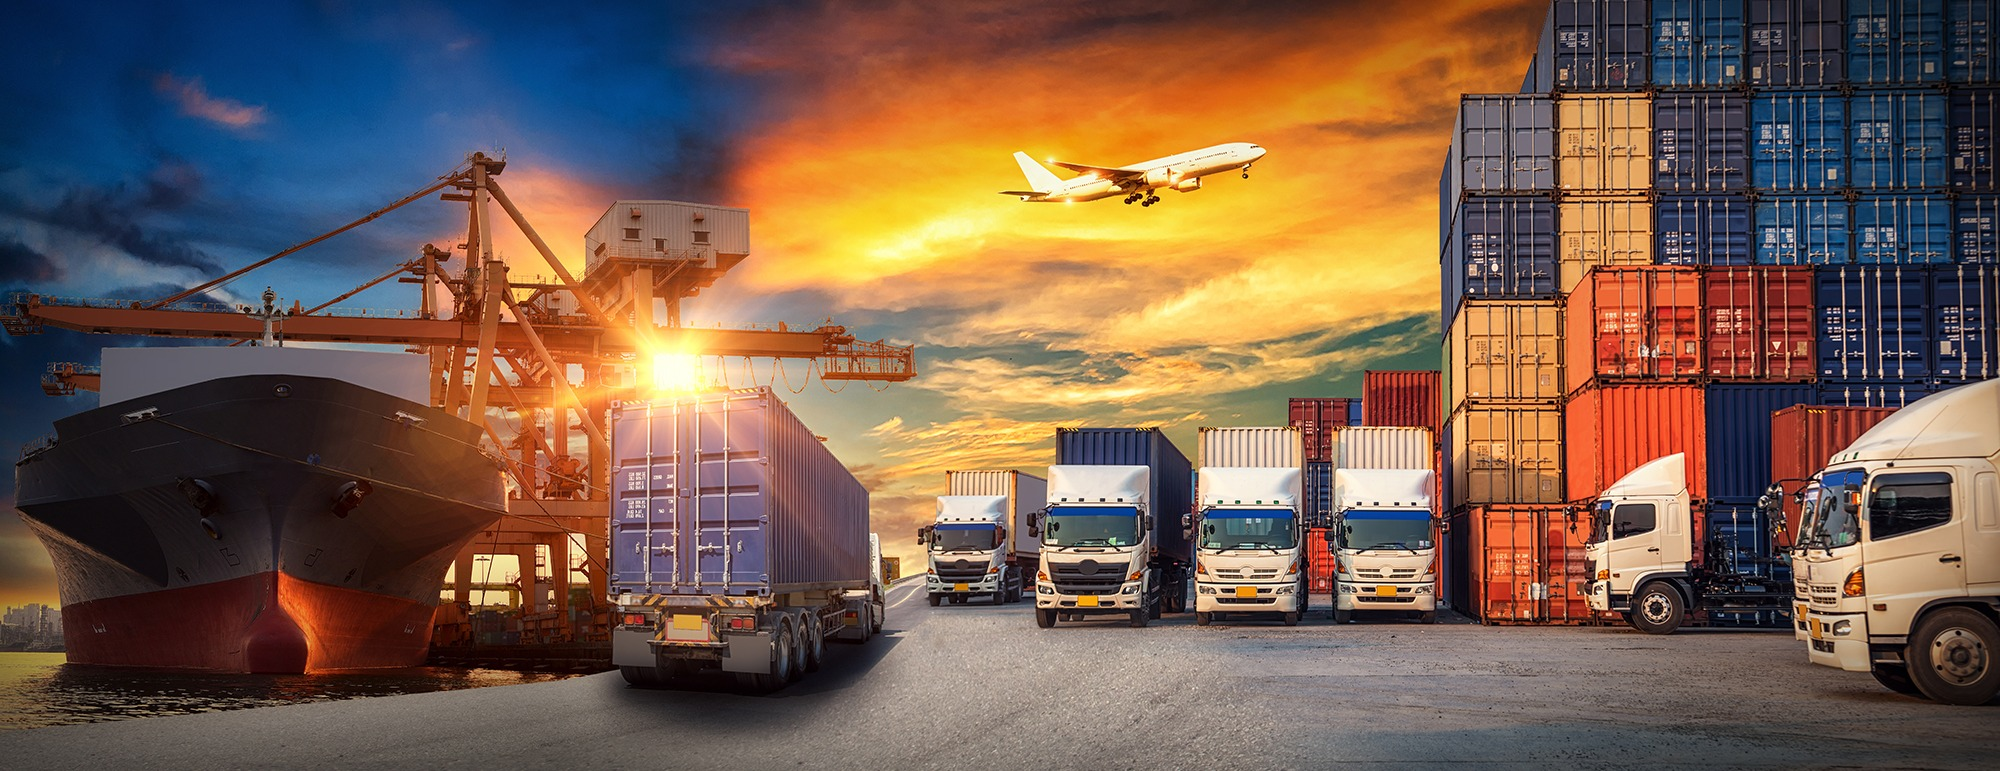 AWI Carbon neutral freight Carbon neutral achievement for Alloy Wire